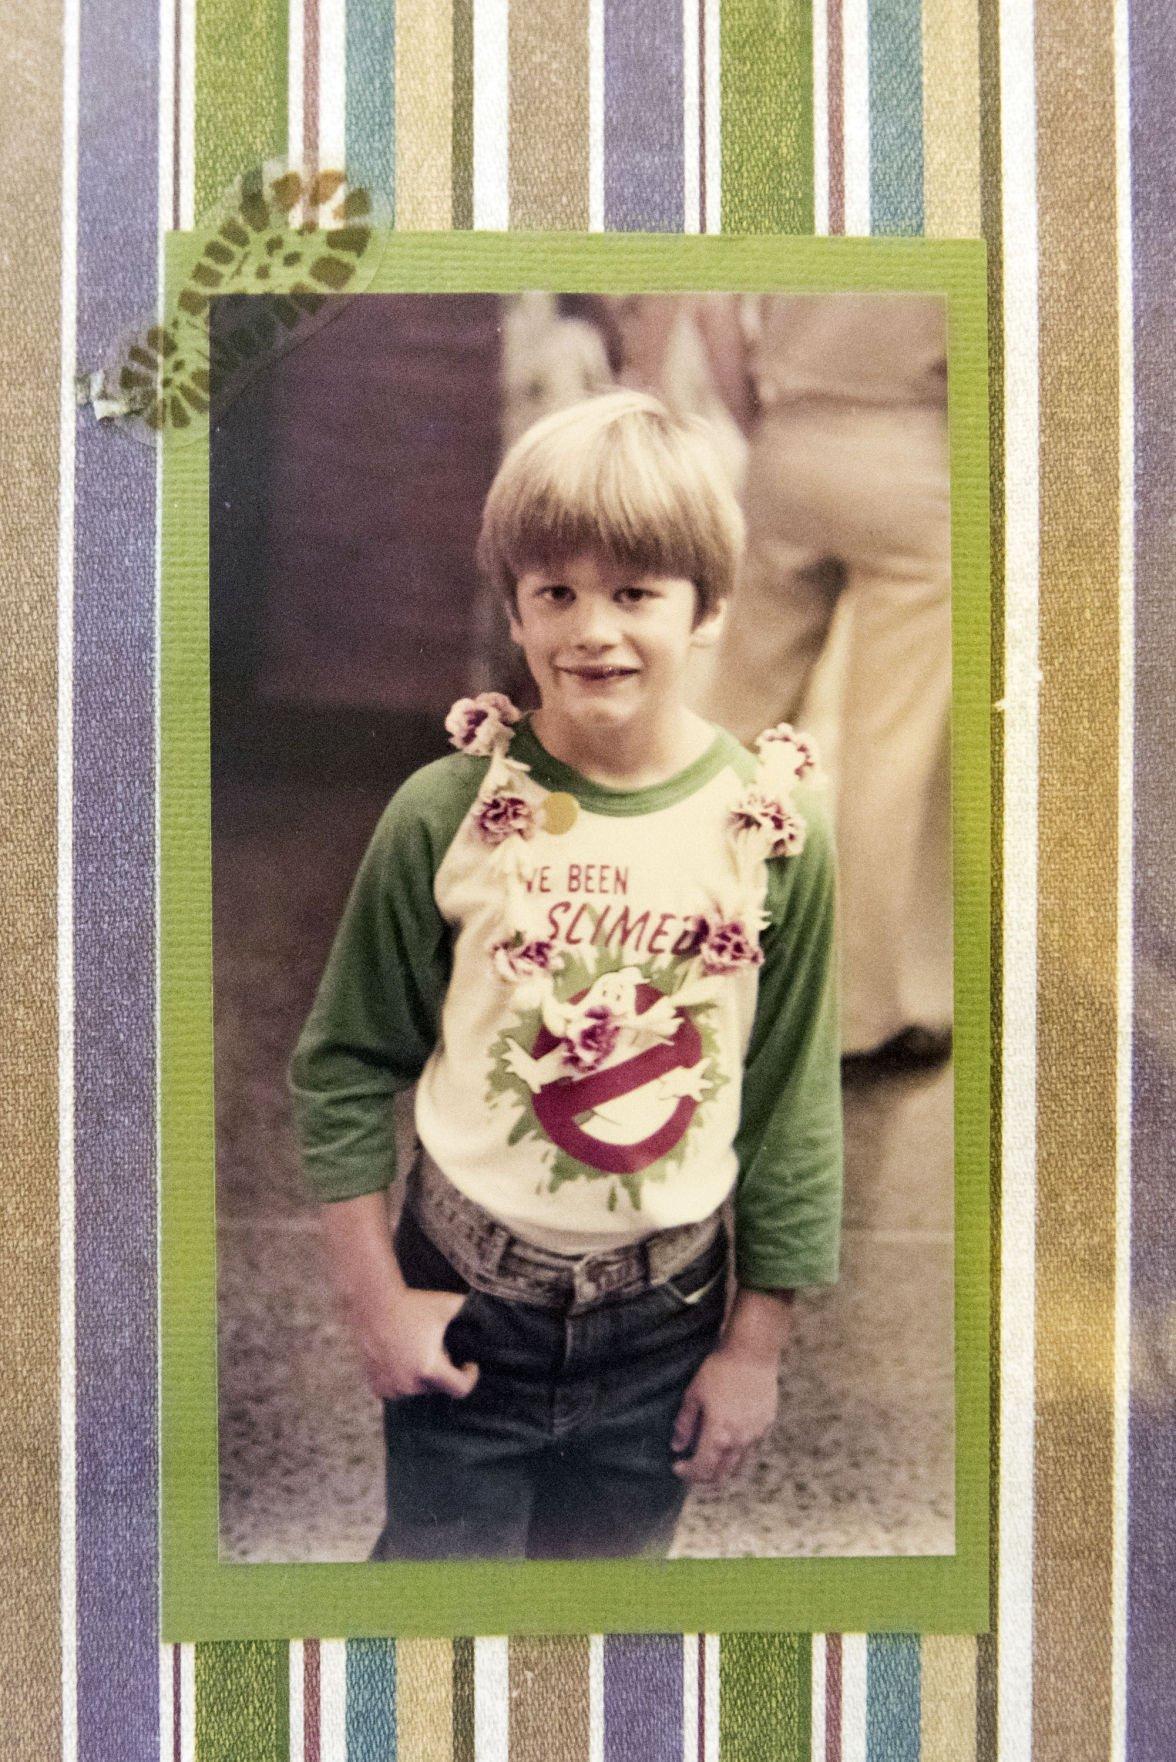 Slideshow: Tom Brady growing up in San Mateo, CA